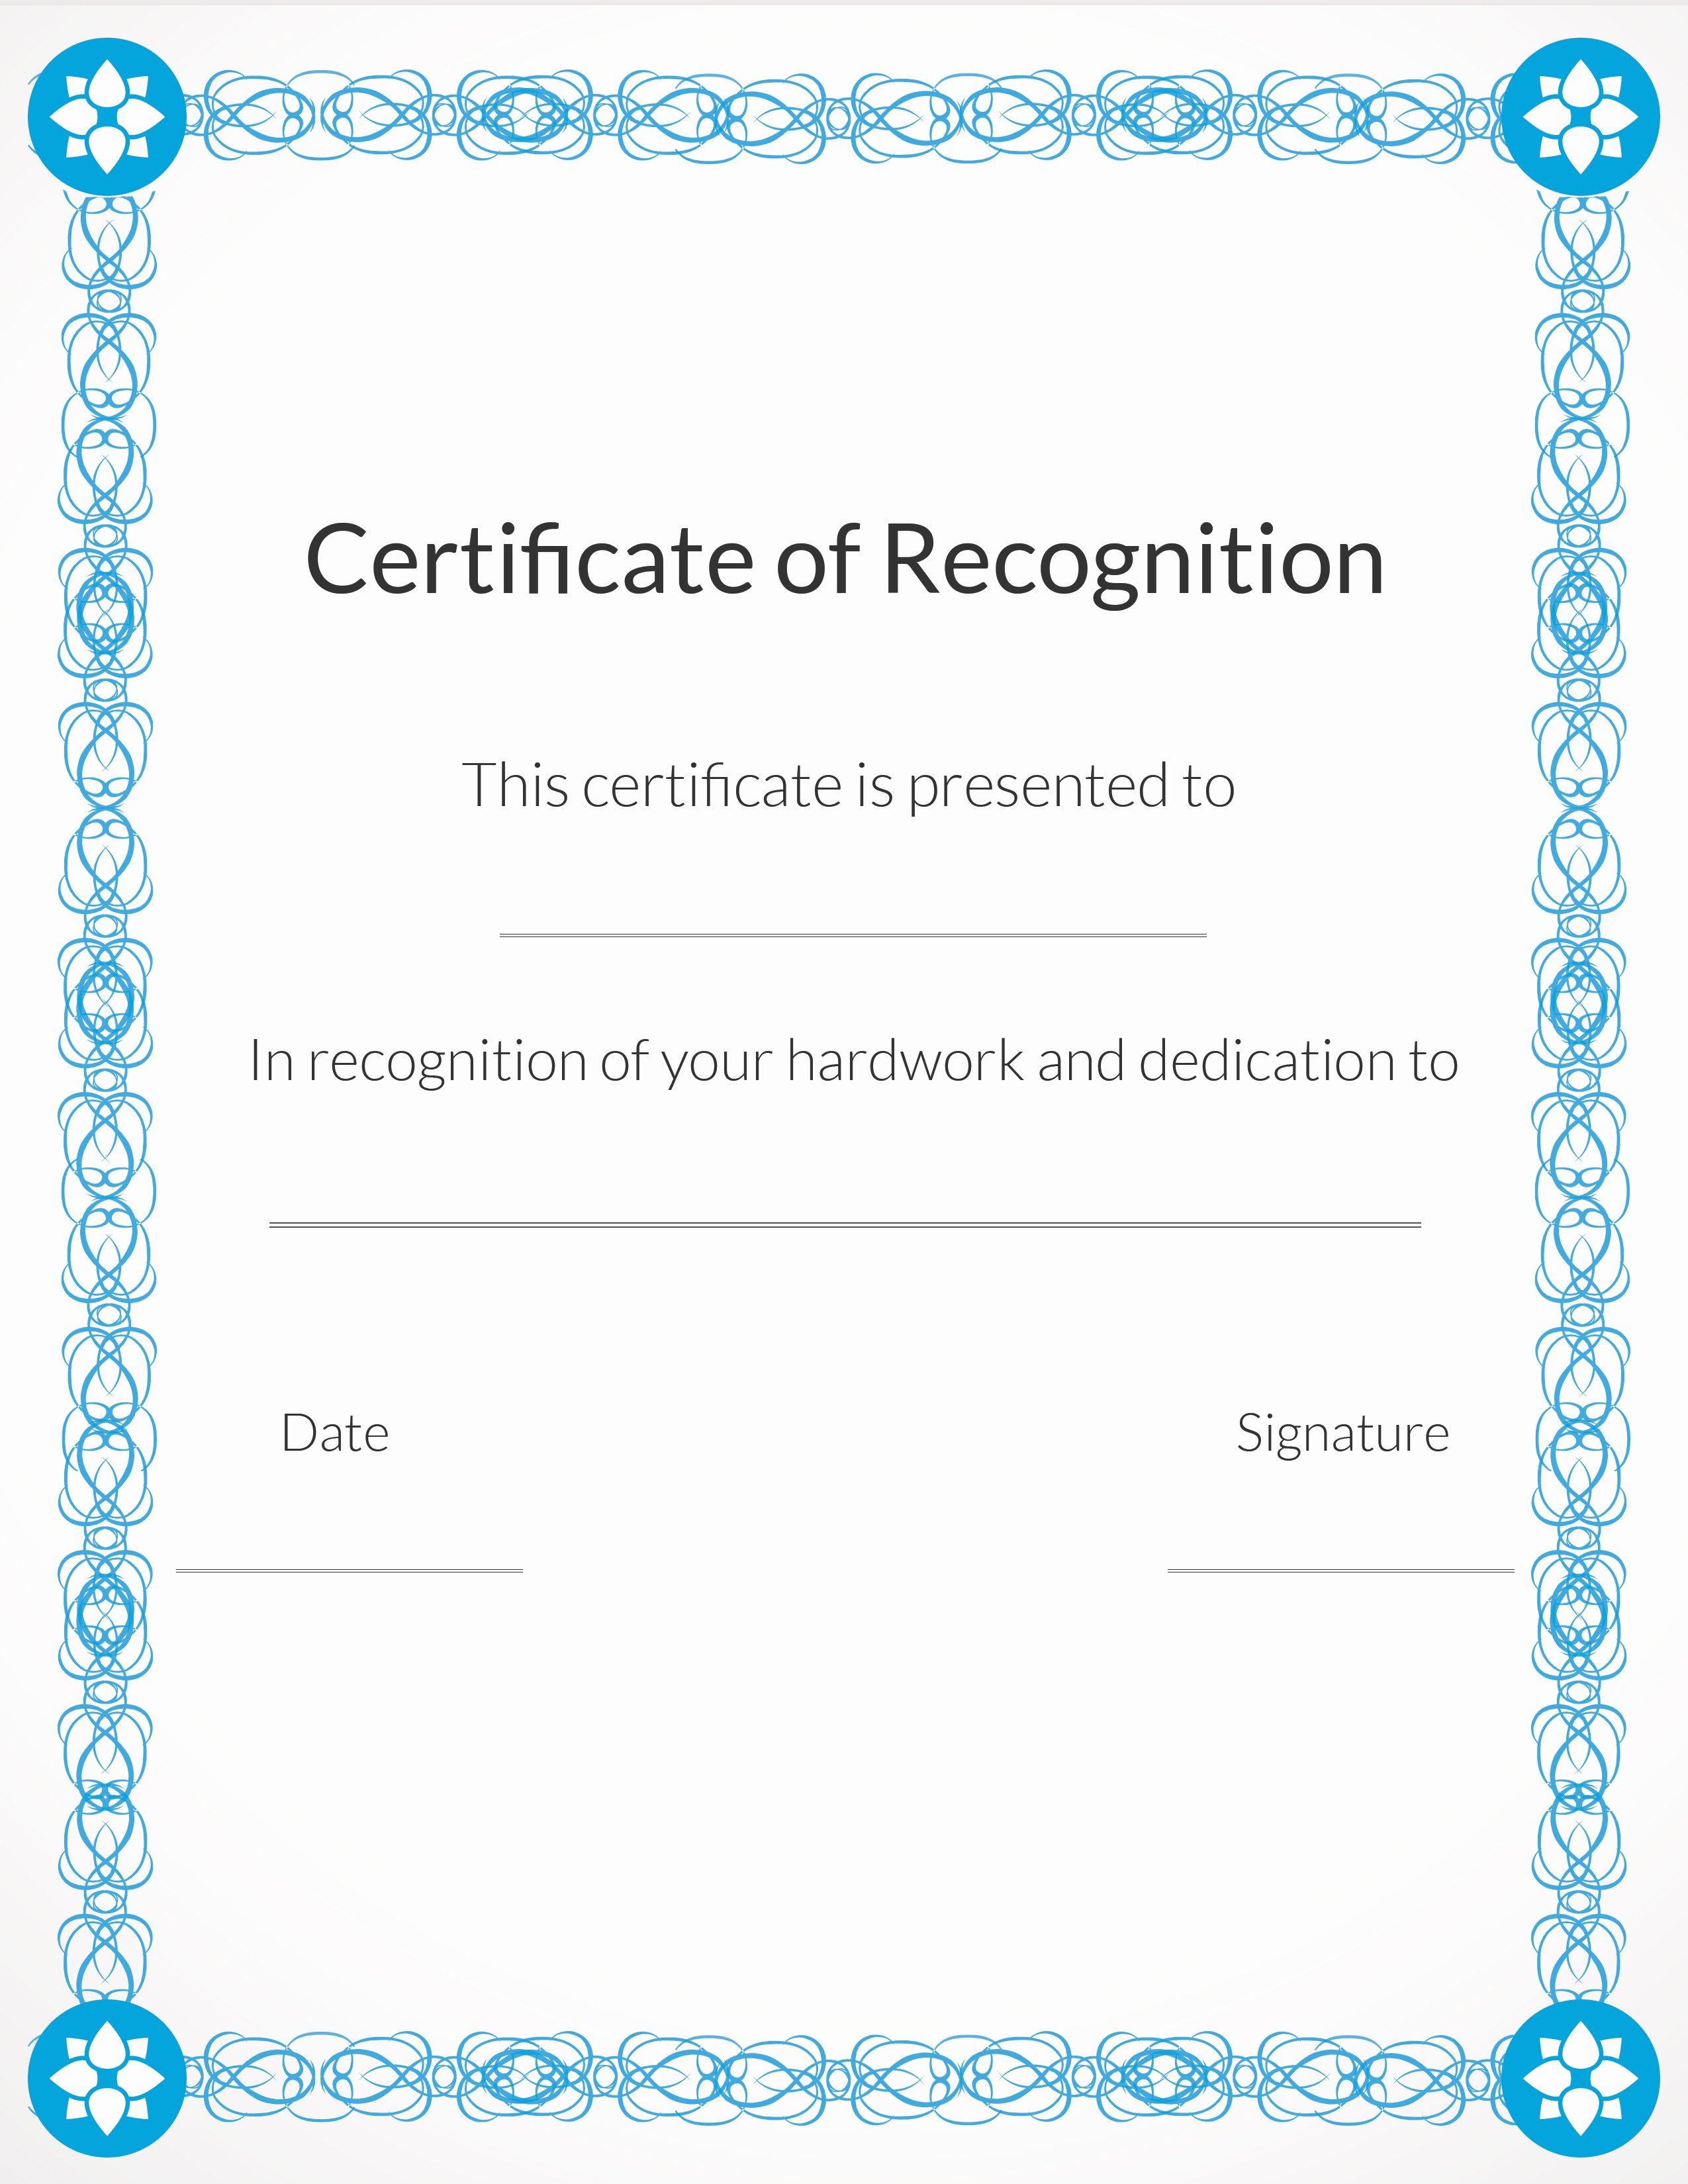 Volunteer Appreciation Certificate Templates Fresh Free Printable Volunteer Appreciation Certificates